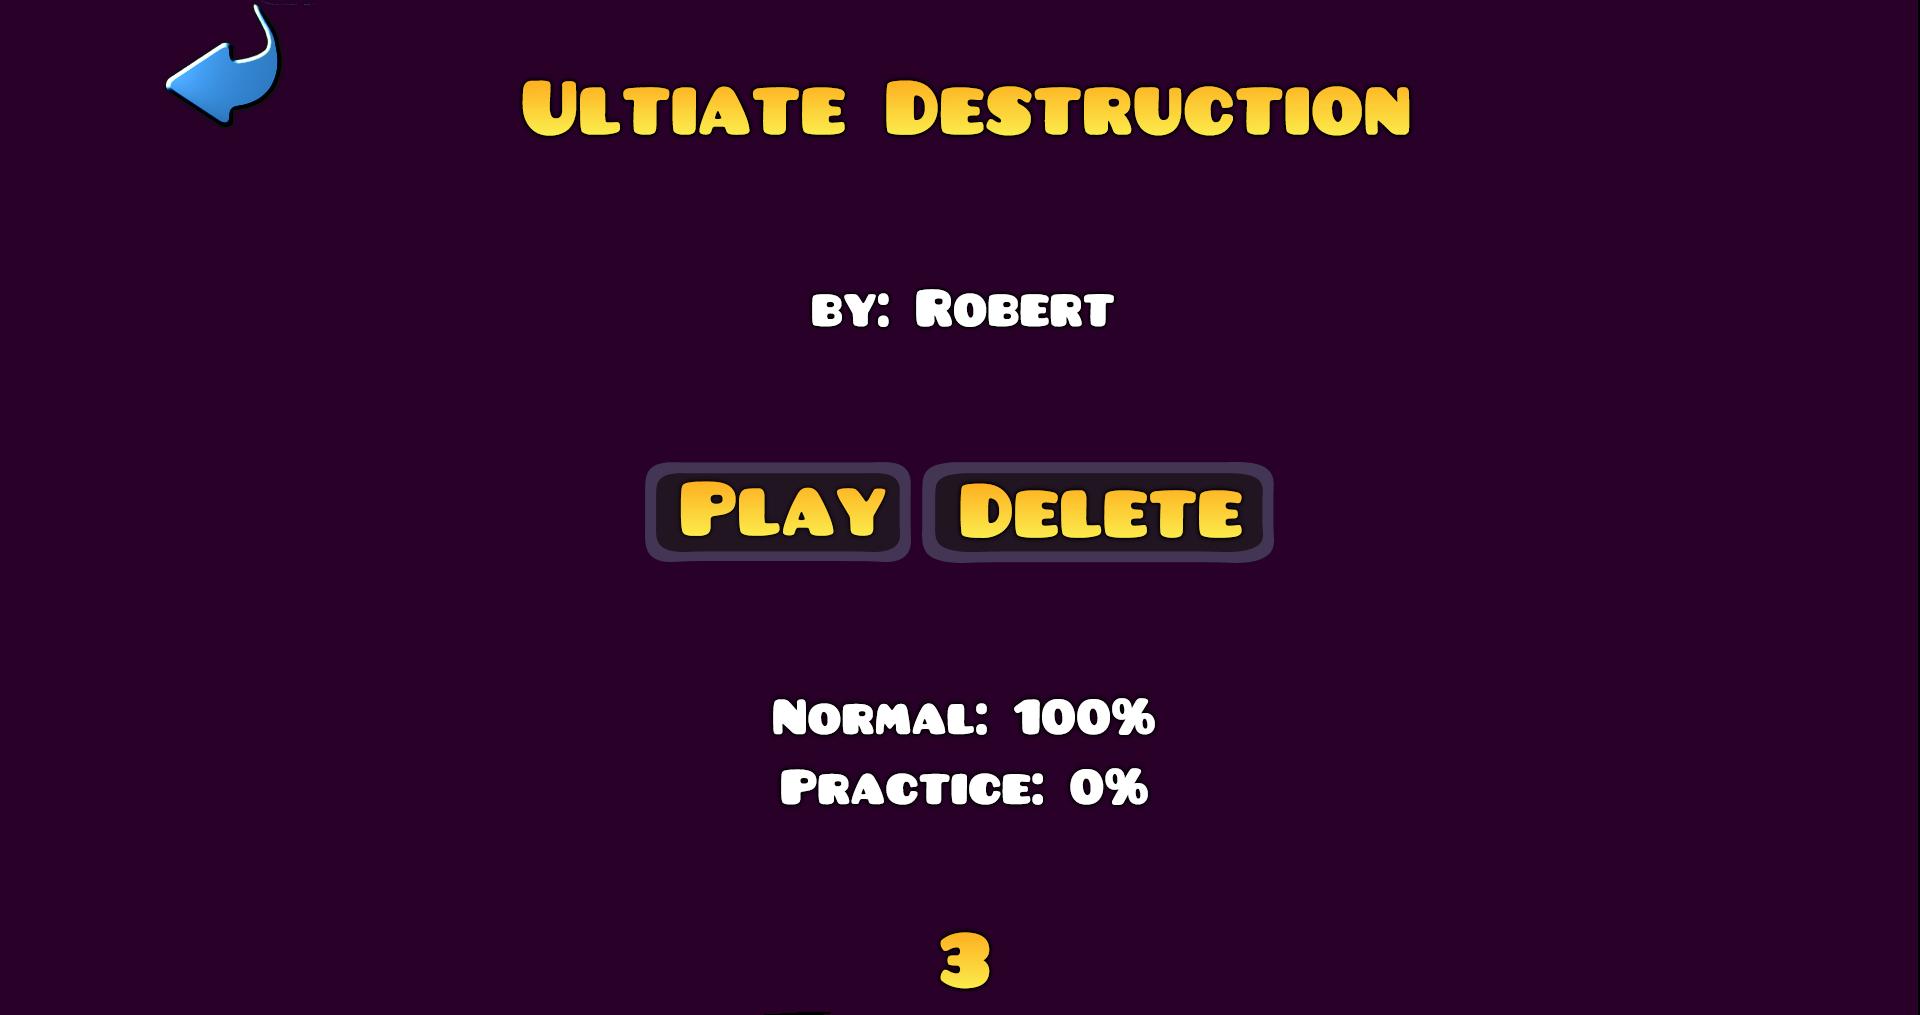 UltimateDestructionMenu.png